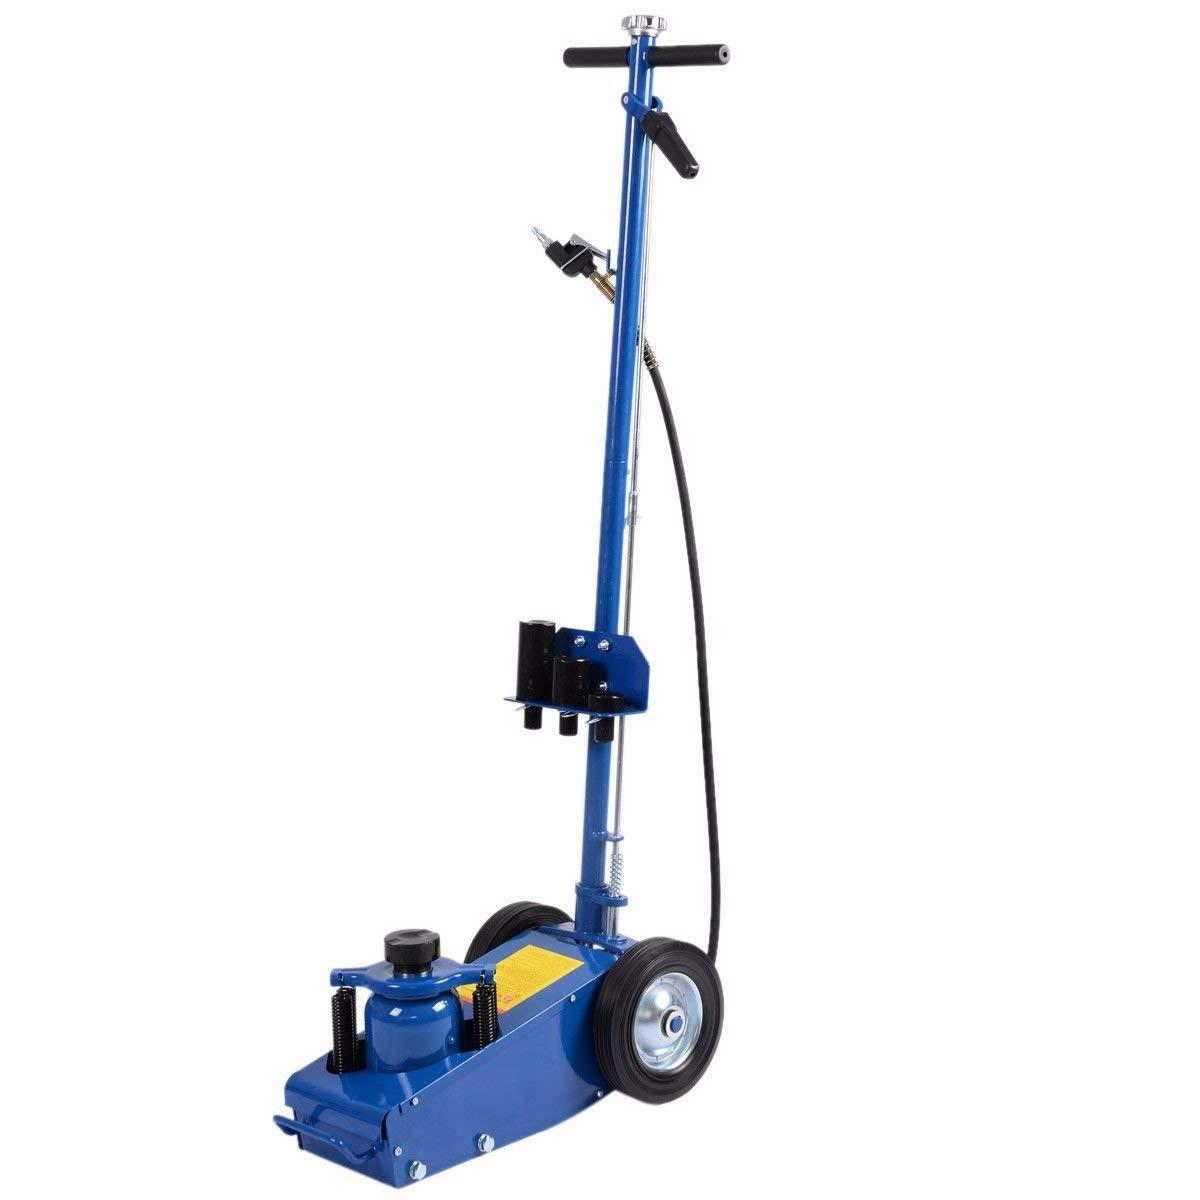 Goplus 22 Ton Air Hydraulic Floor Jack Truck Lift Jacks Service Repair Lifting Tool with Wheels